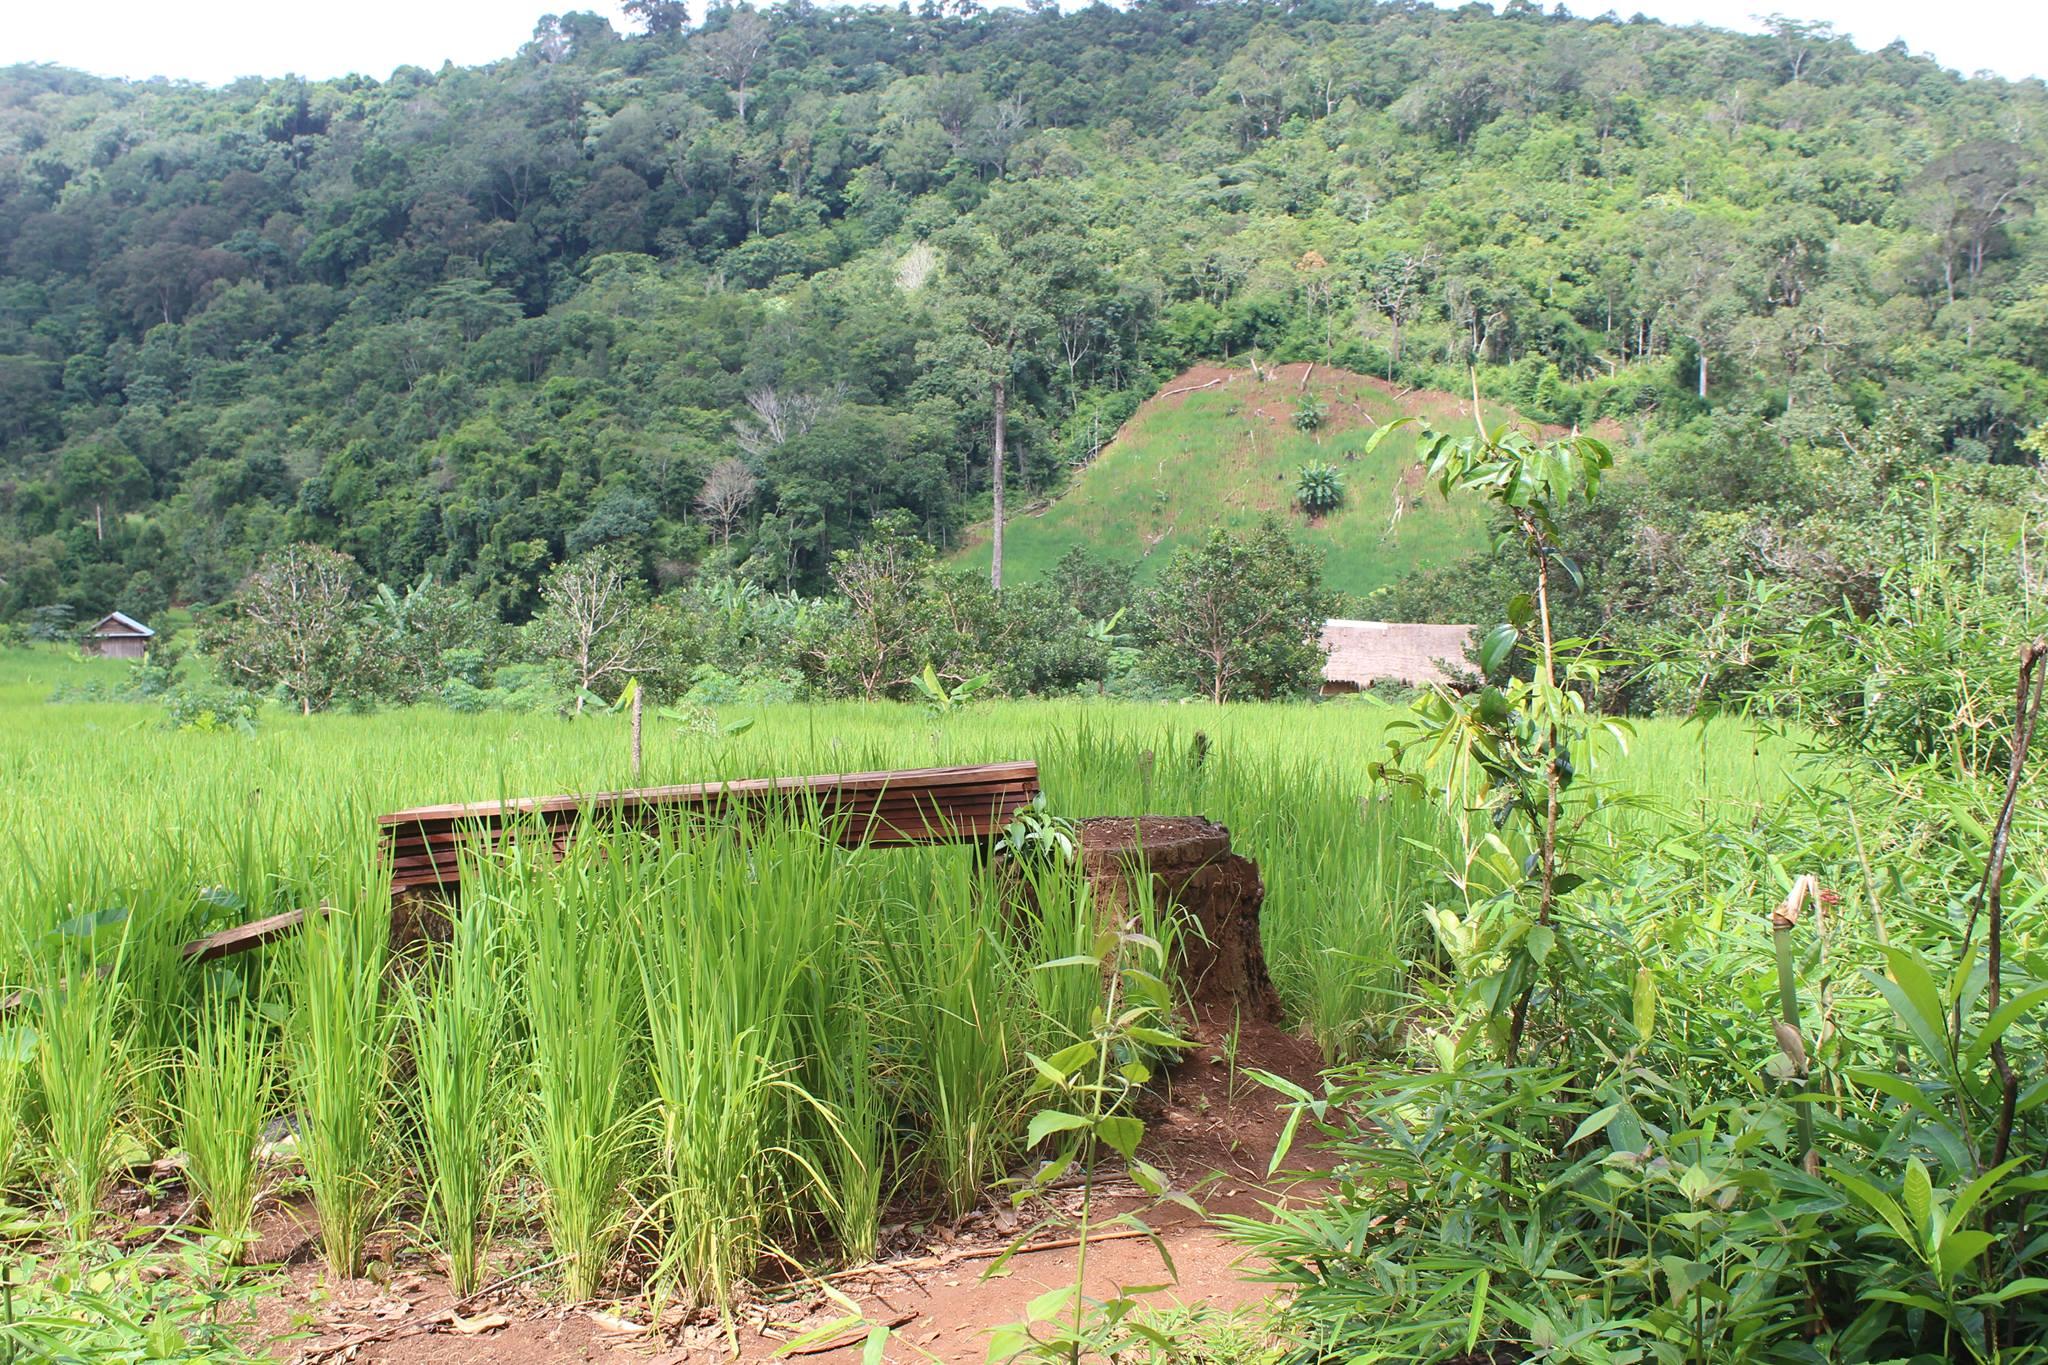 Green Cultural Travel - Cambodia - Mondulkiri - Rice fields and jungle